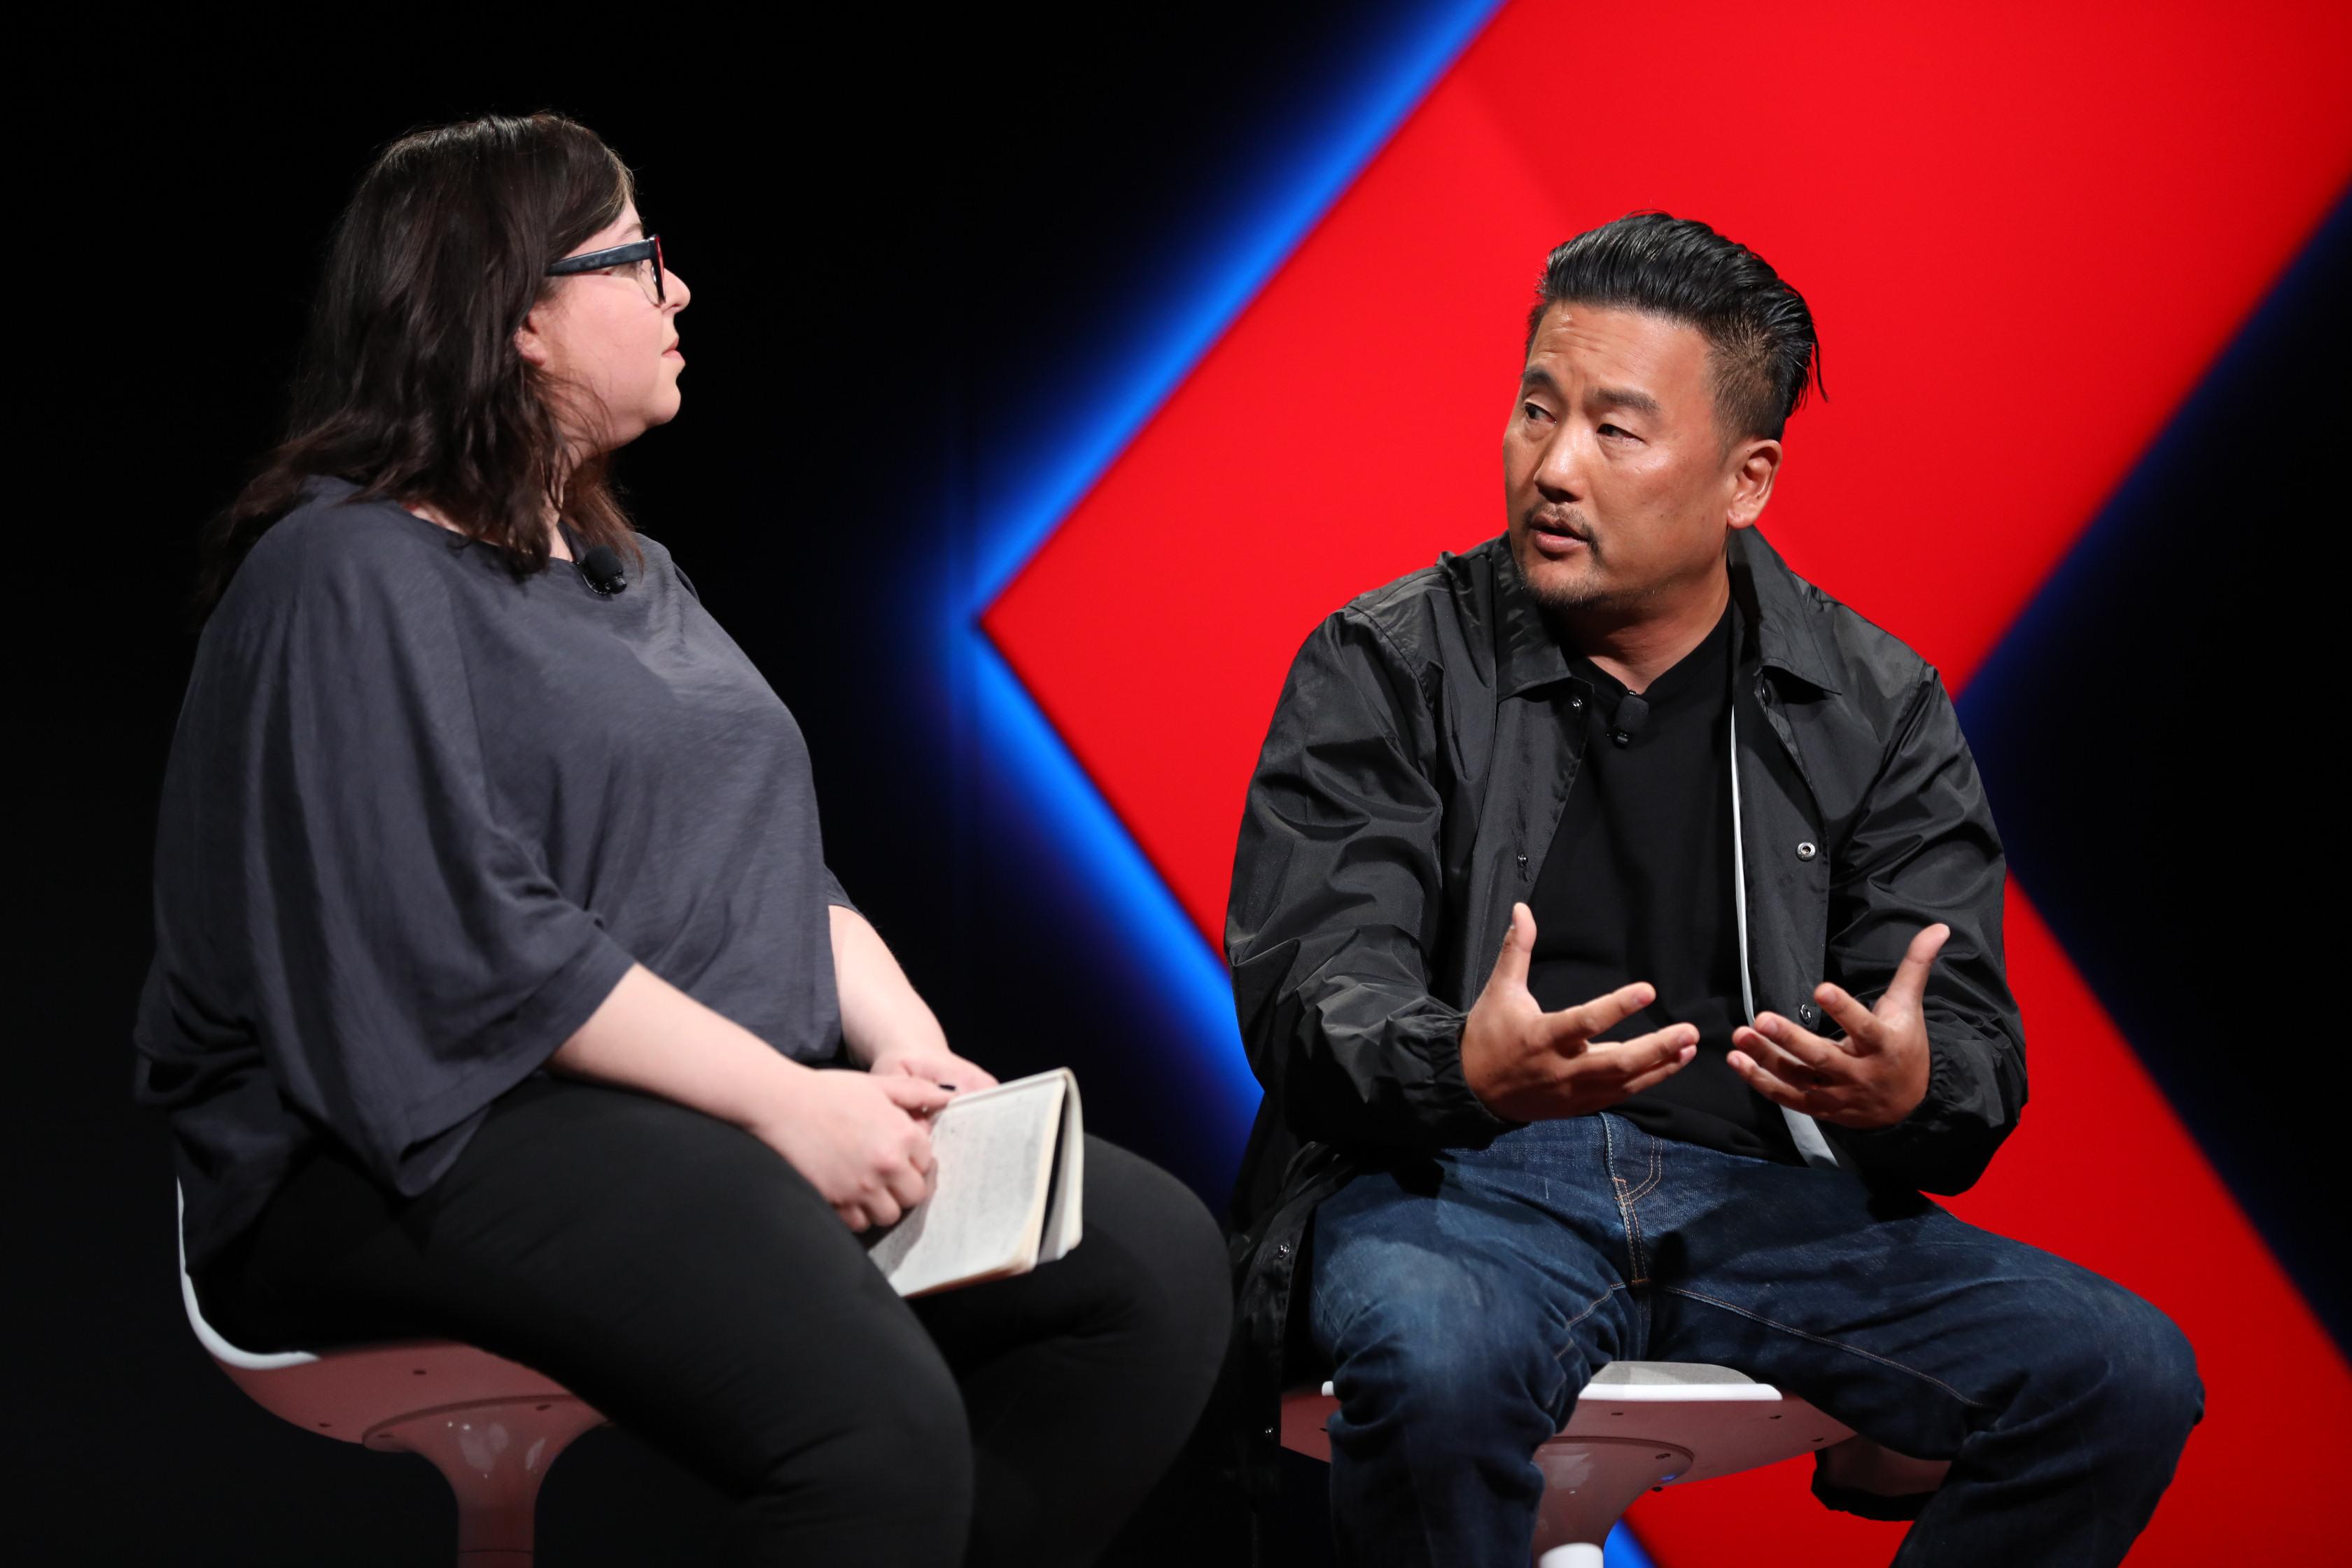 Roy Choi, Code 2017, LocoL